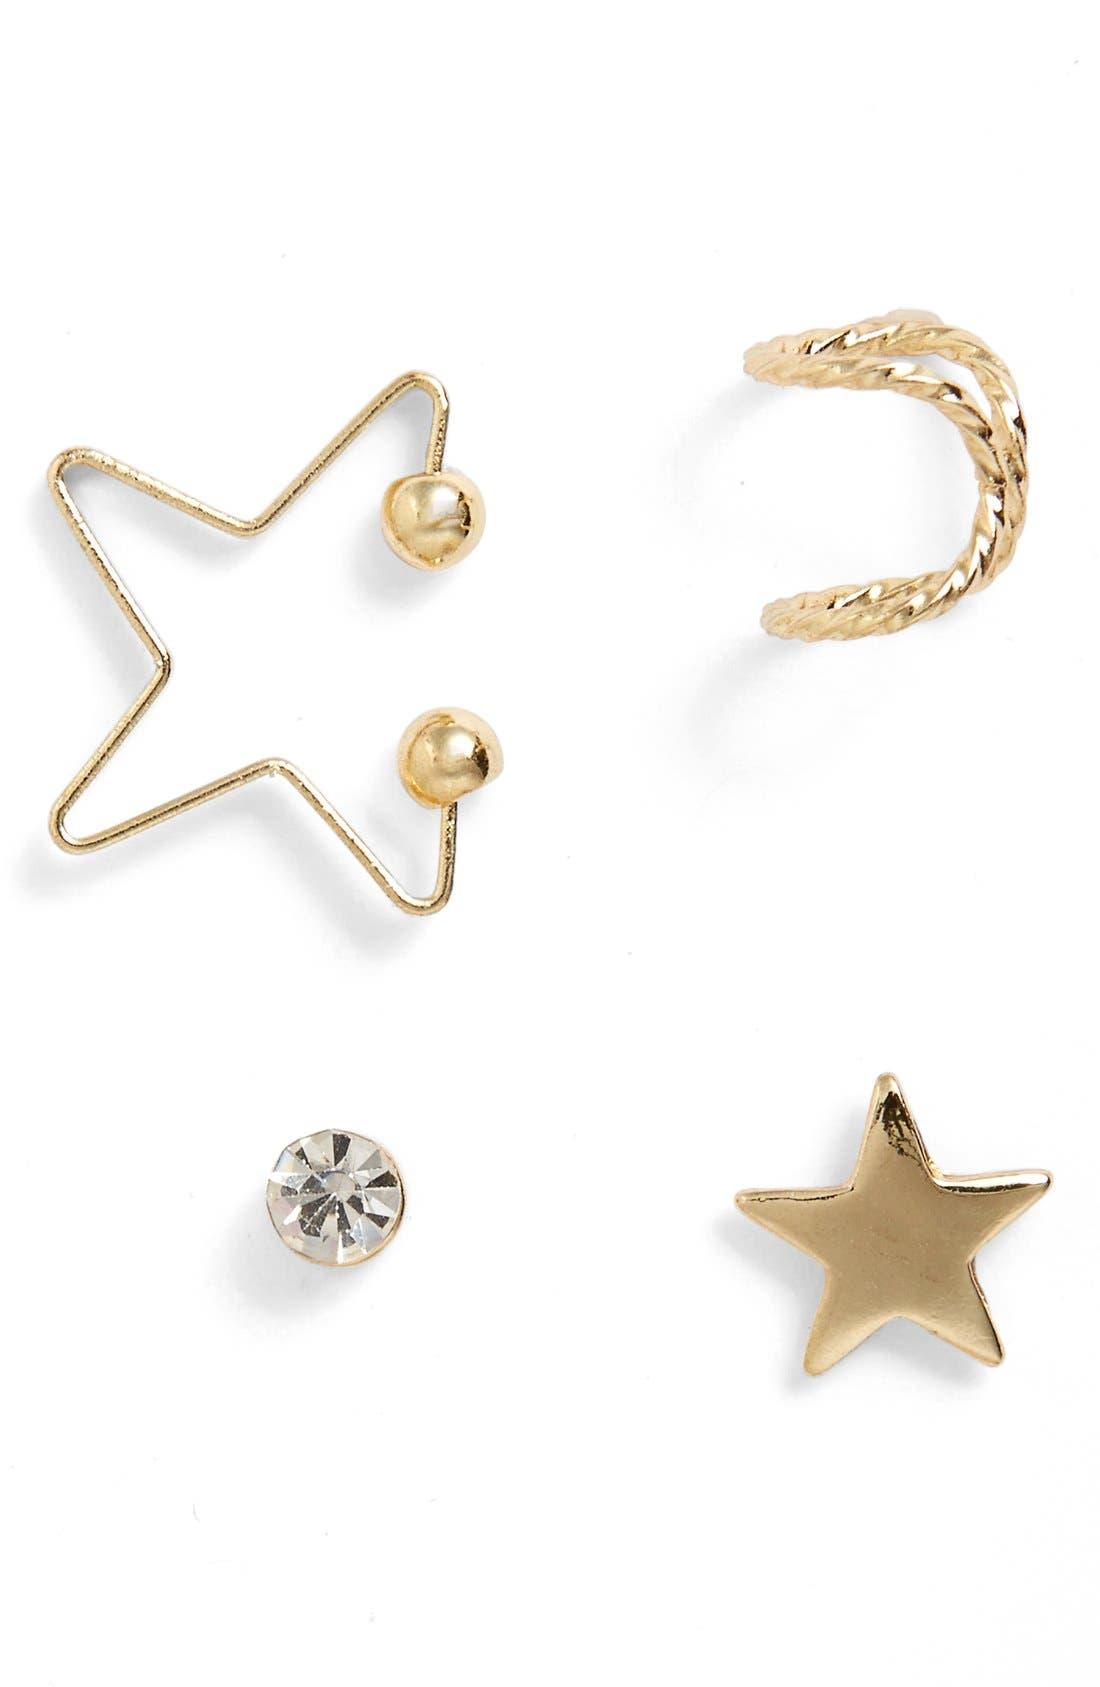 Alternate Image 1 Selected - Topshop Star Ear Cuff & Earrings (Set of 4)